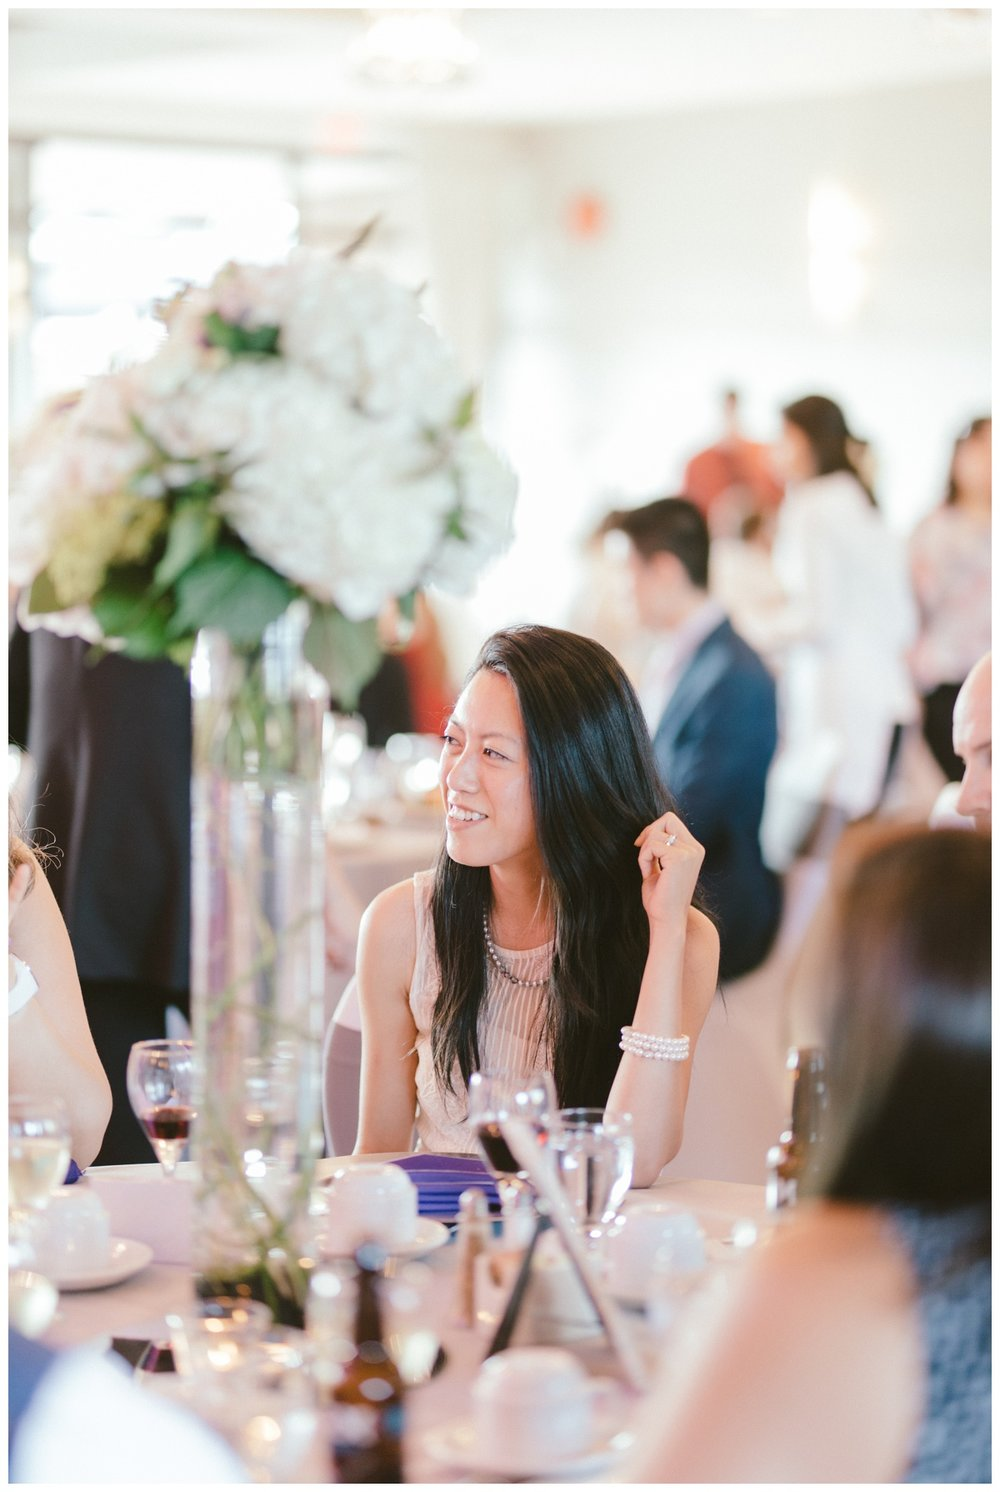 Mattie C. Fine Art Wedding Prewedding Photography Vancouver and Hong Kong 114.jpg